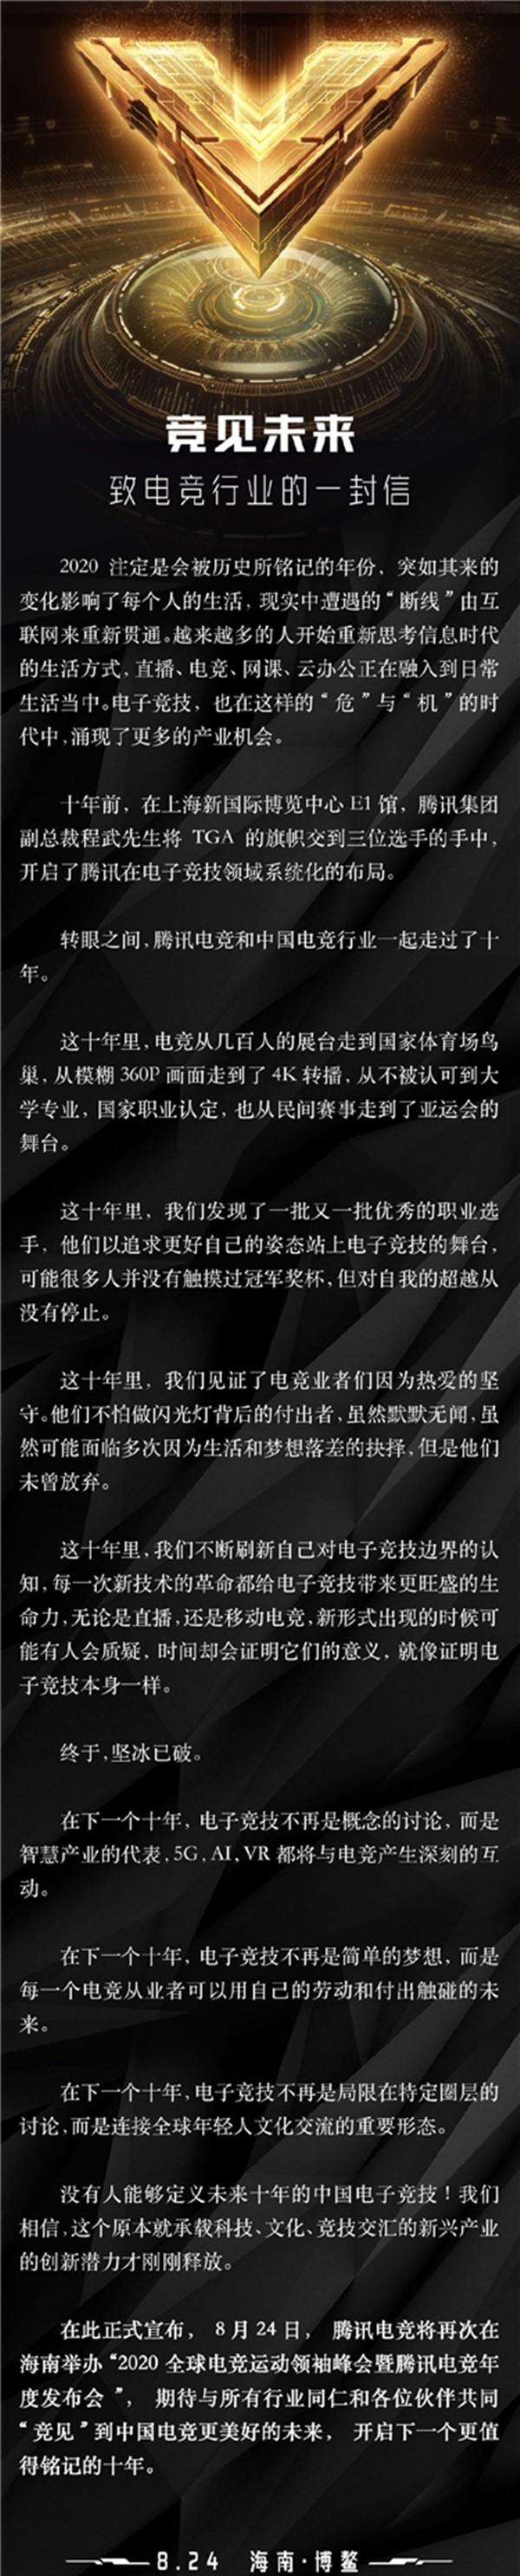 http://www.youxixj.com/remengonglue/325304.html